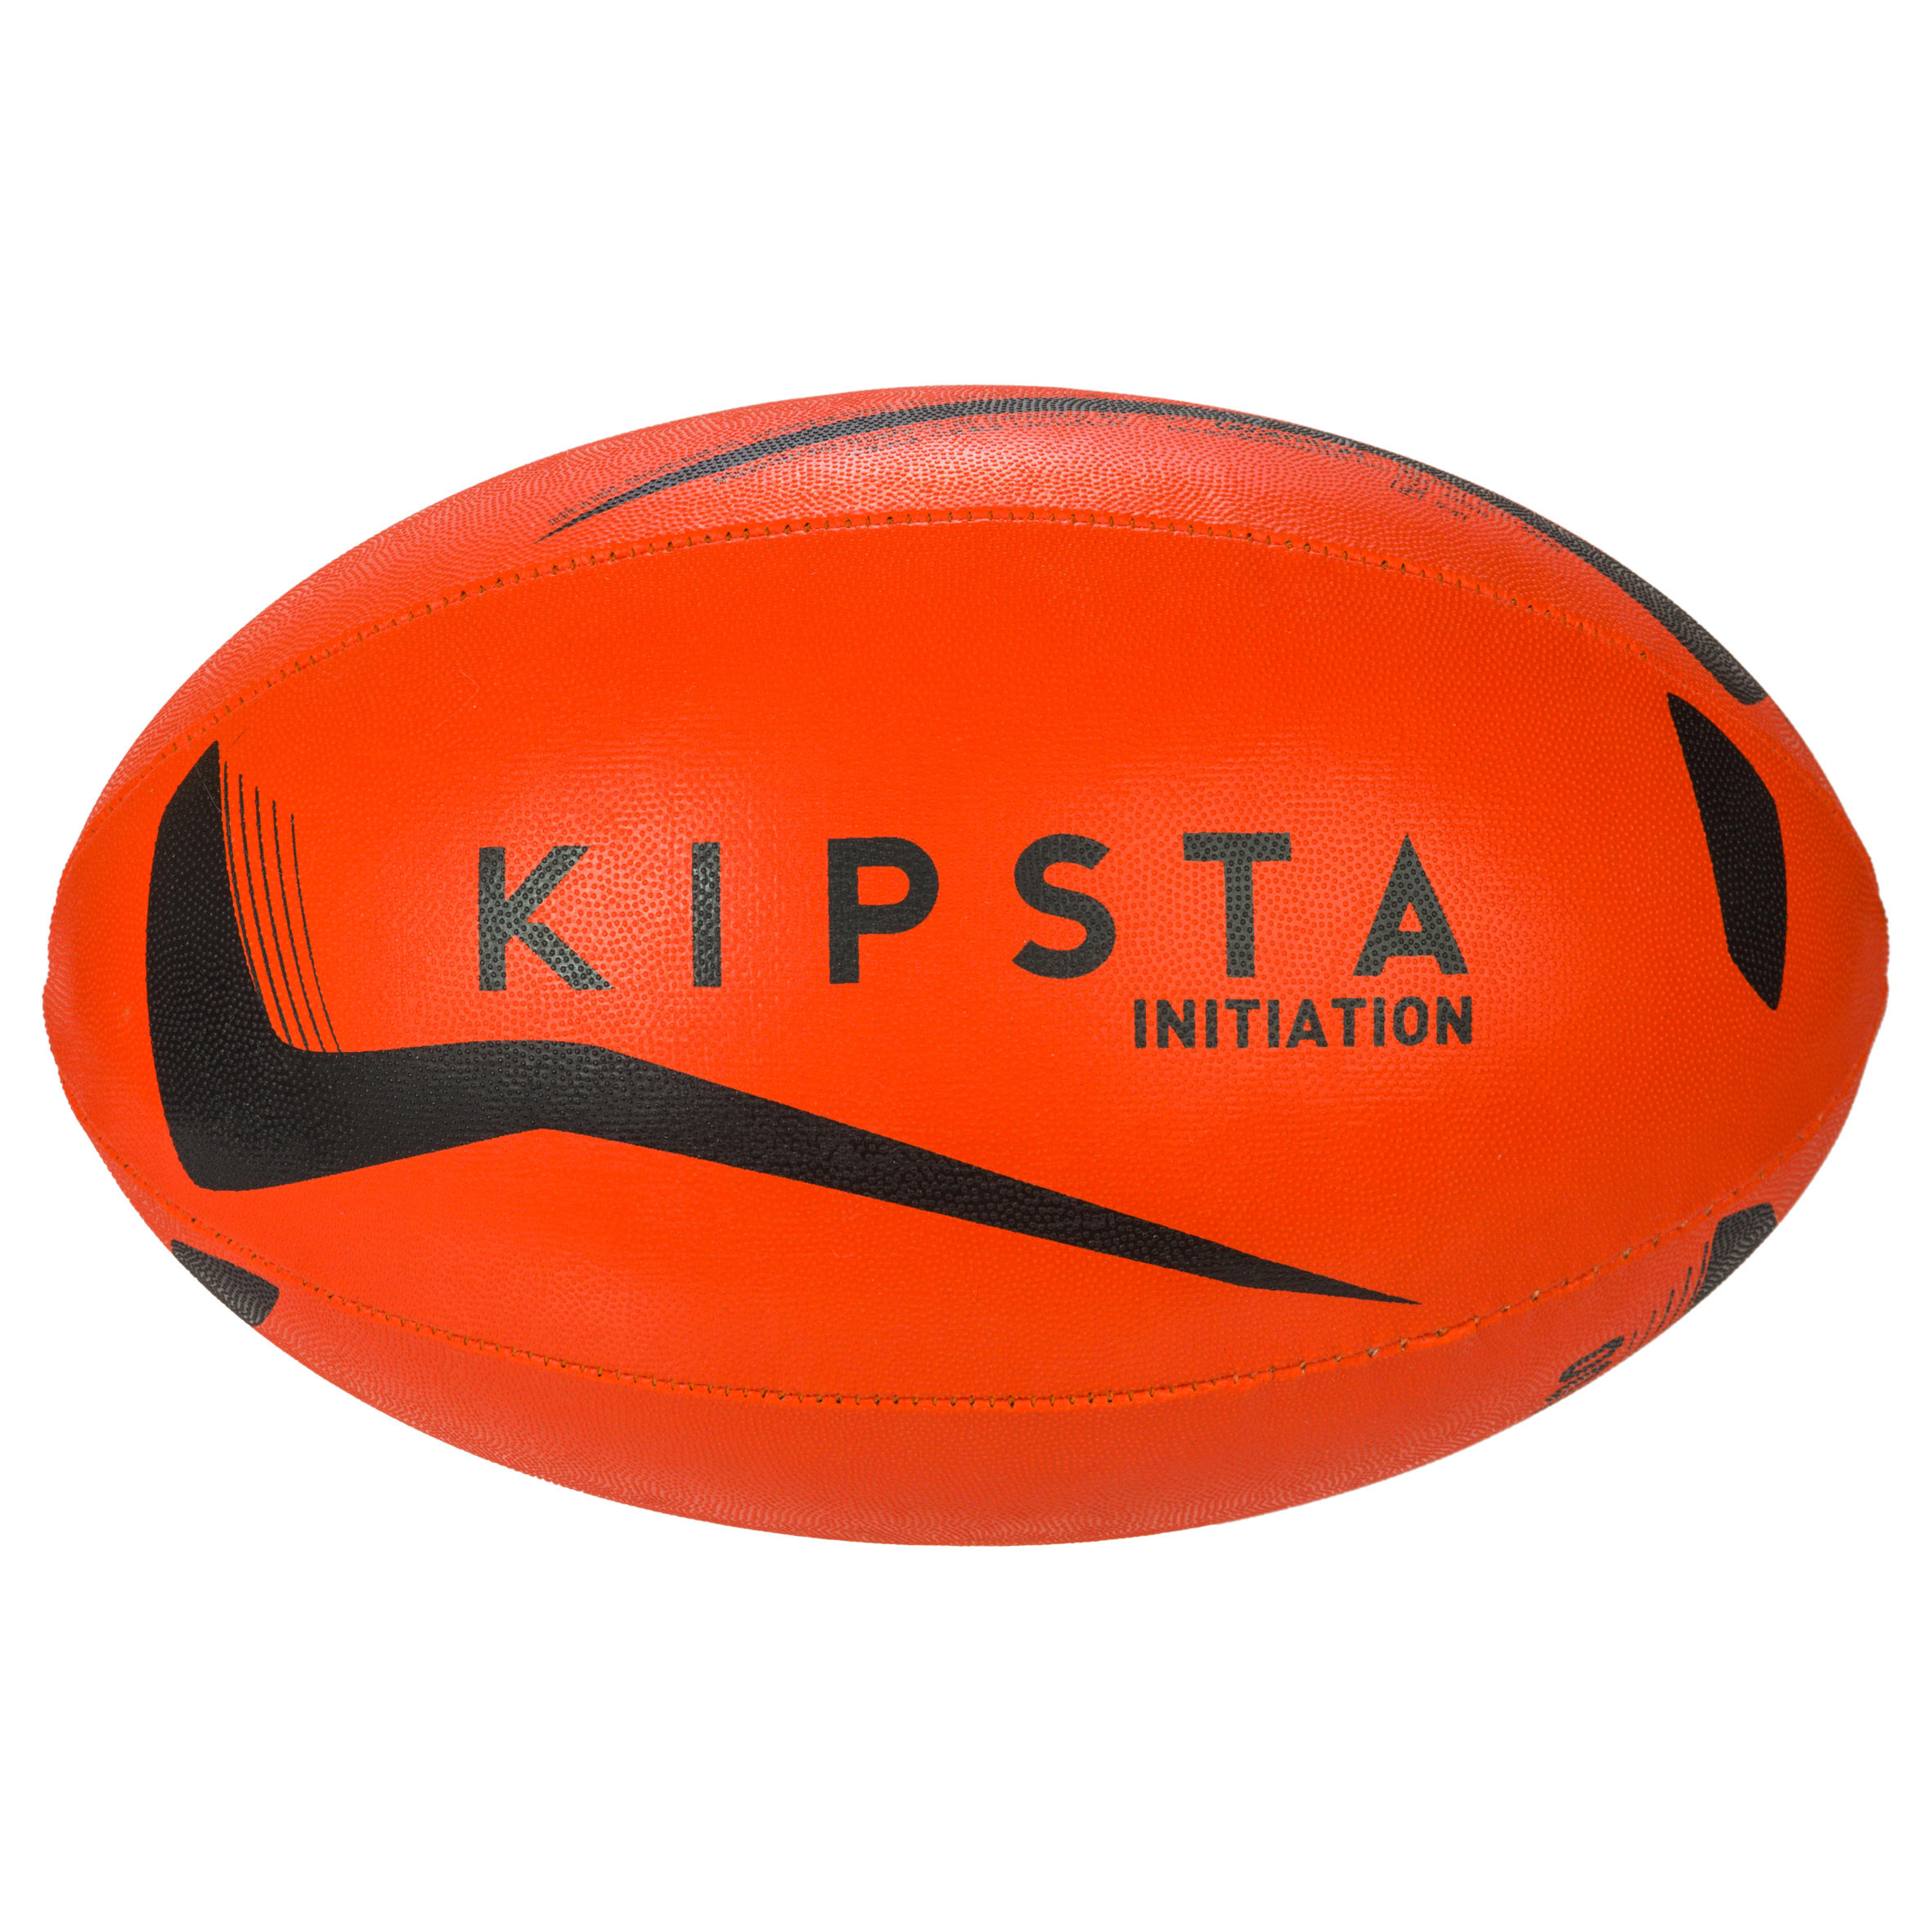 R100 Size 4 Rugby Ball - Orange